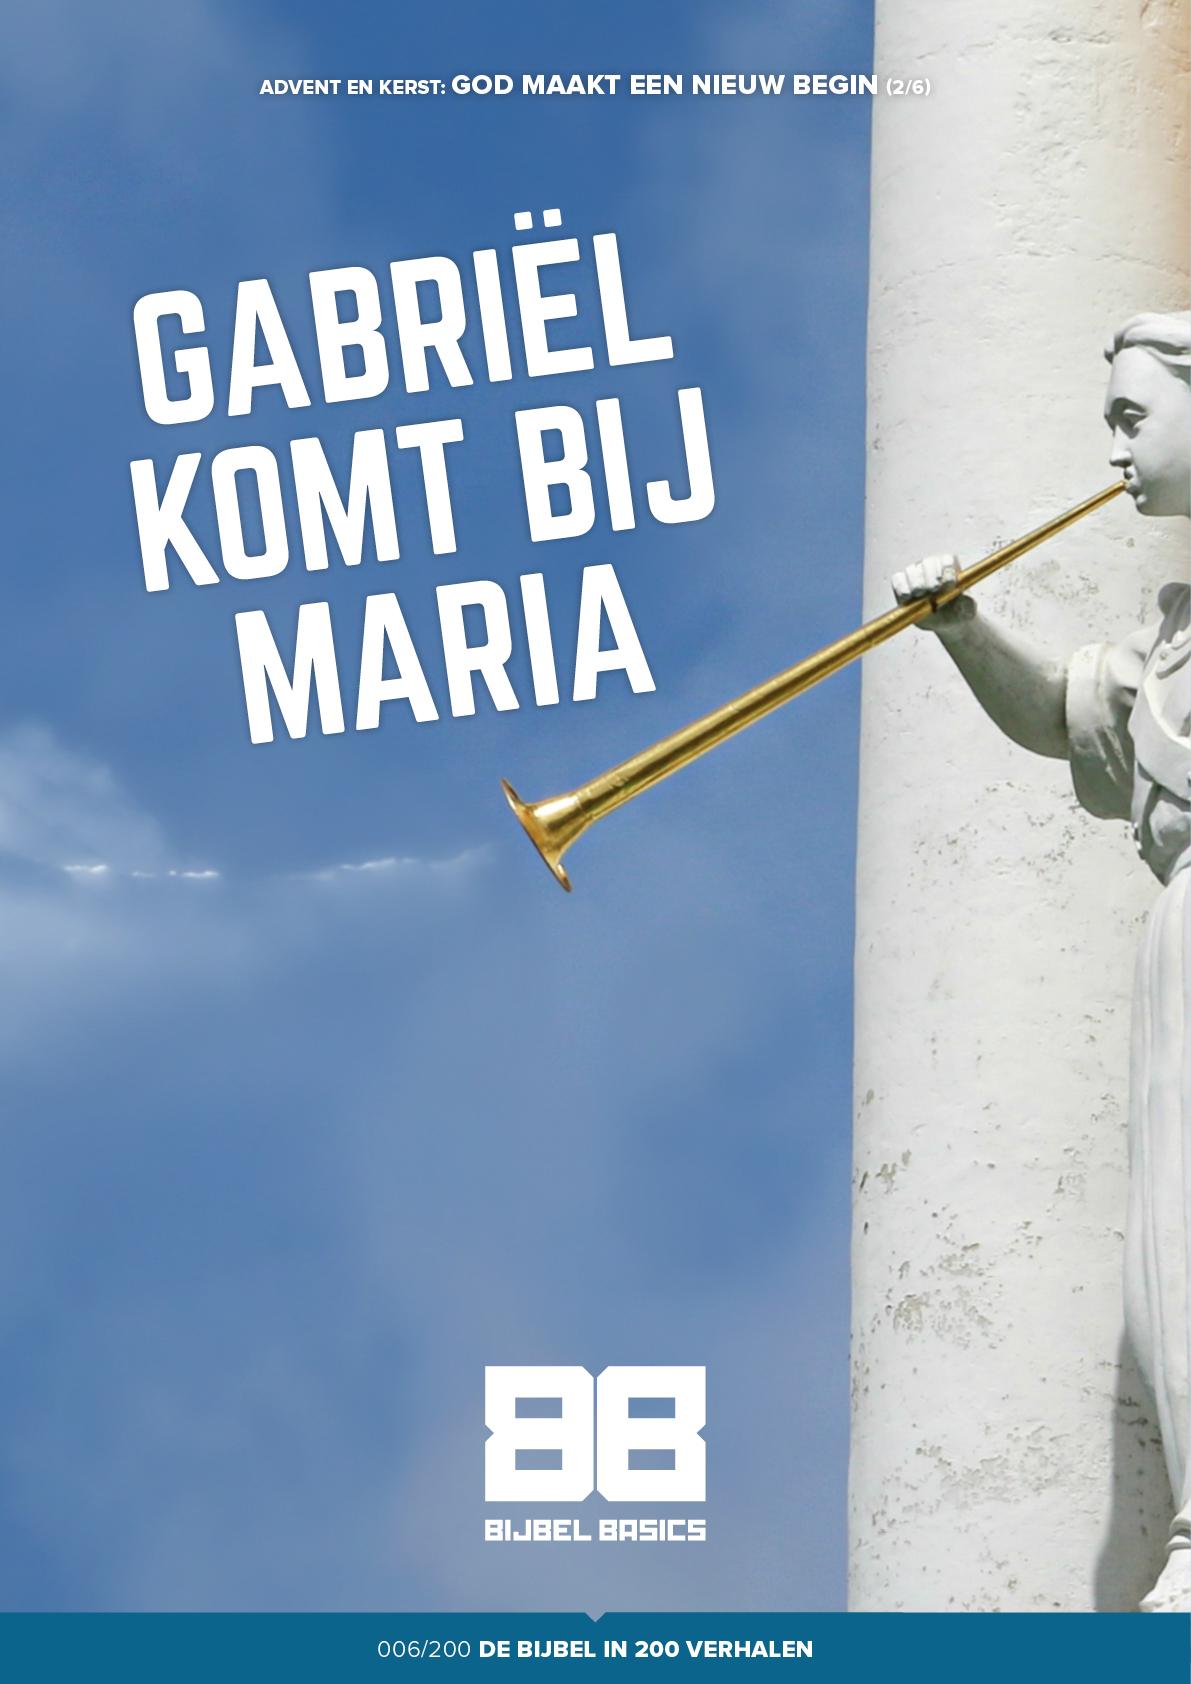 Gabriël komt bij Maria